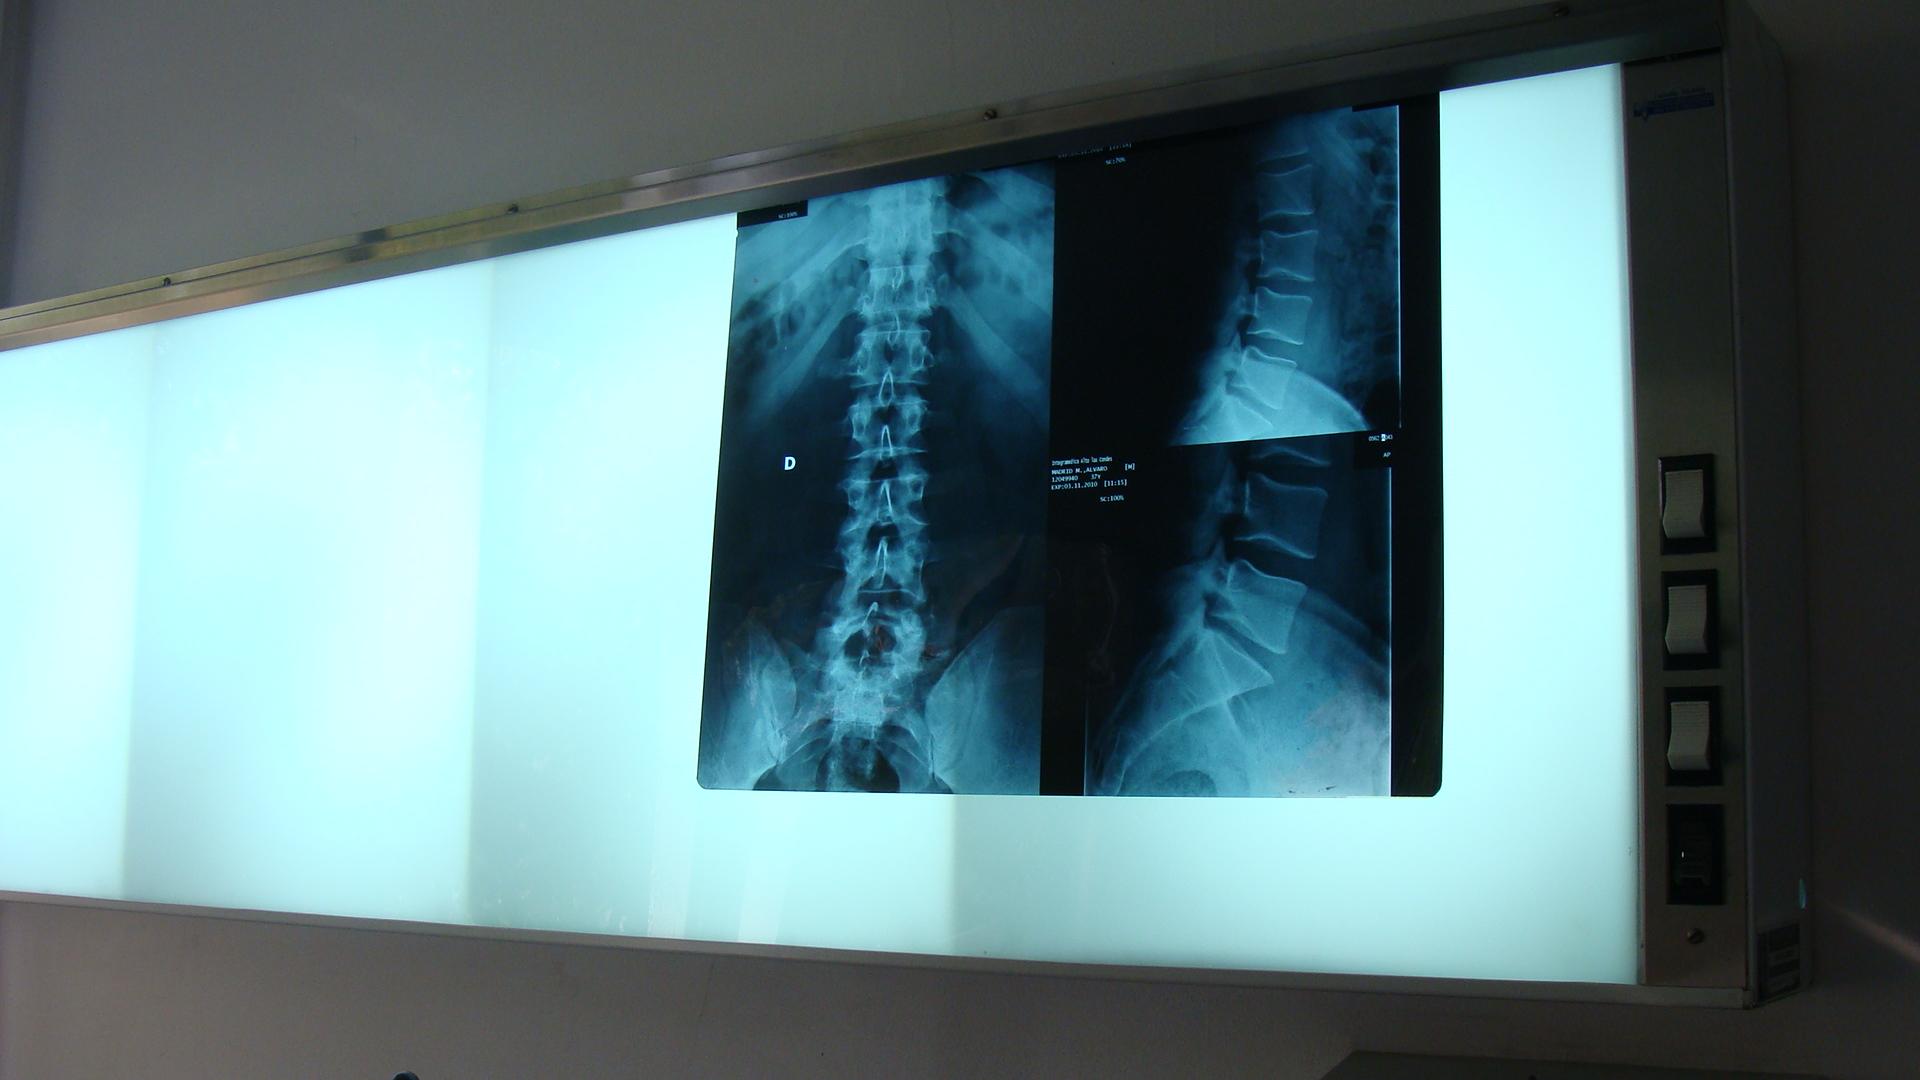 kinesiologia - radiografia - clinica de ejercicio kw - la reina.JPG